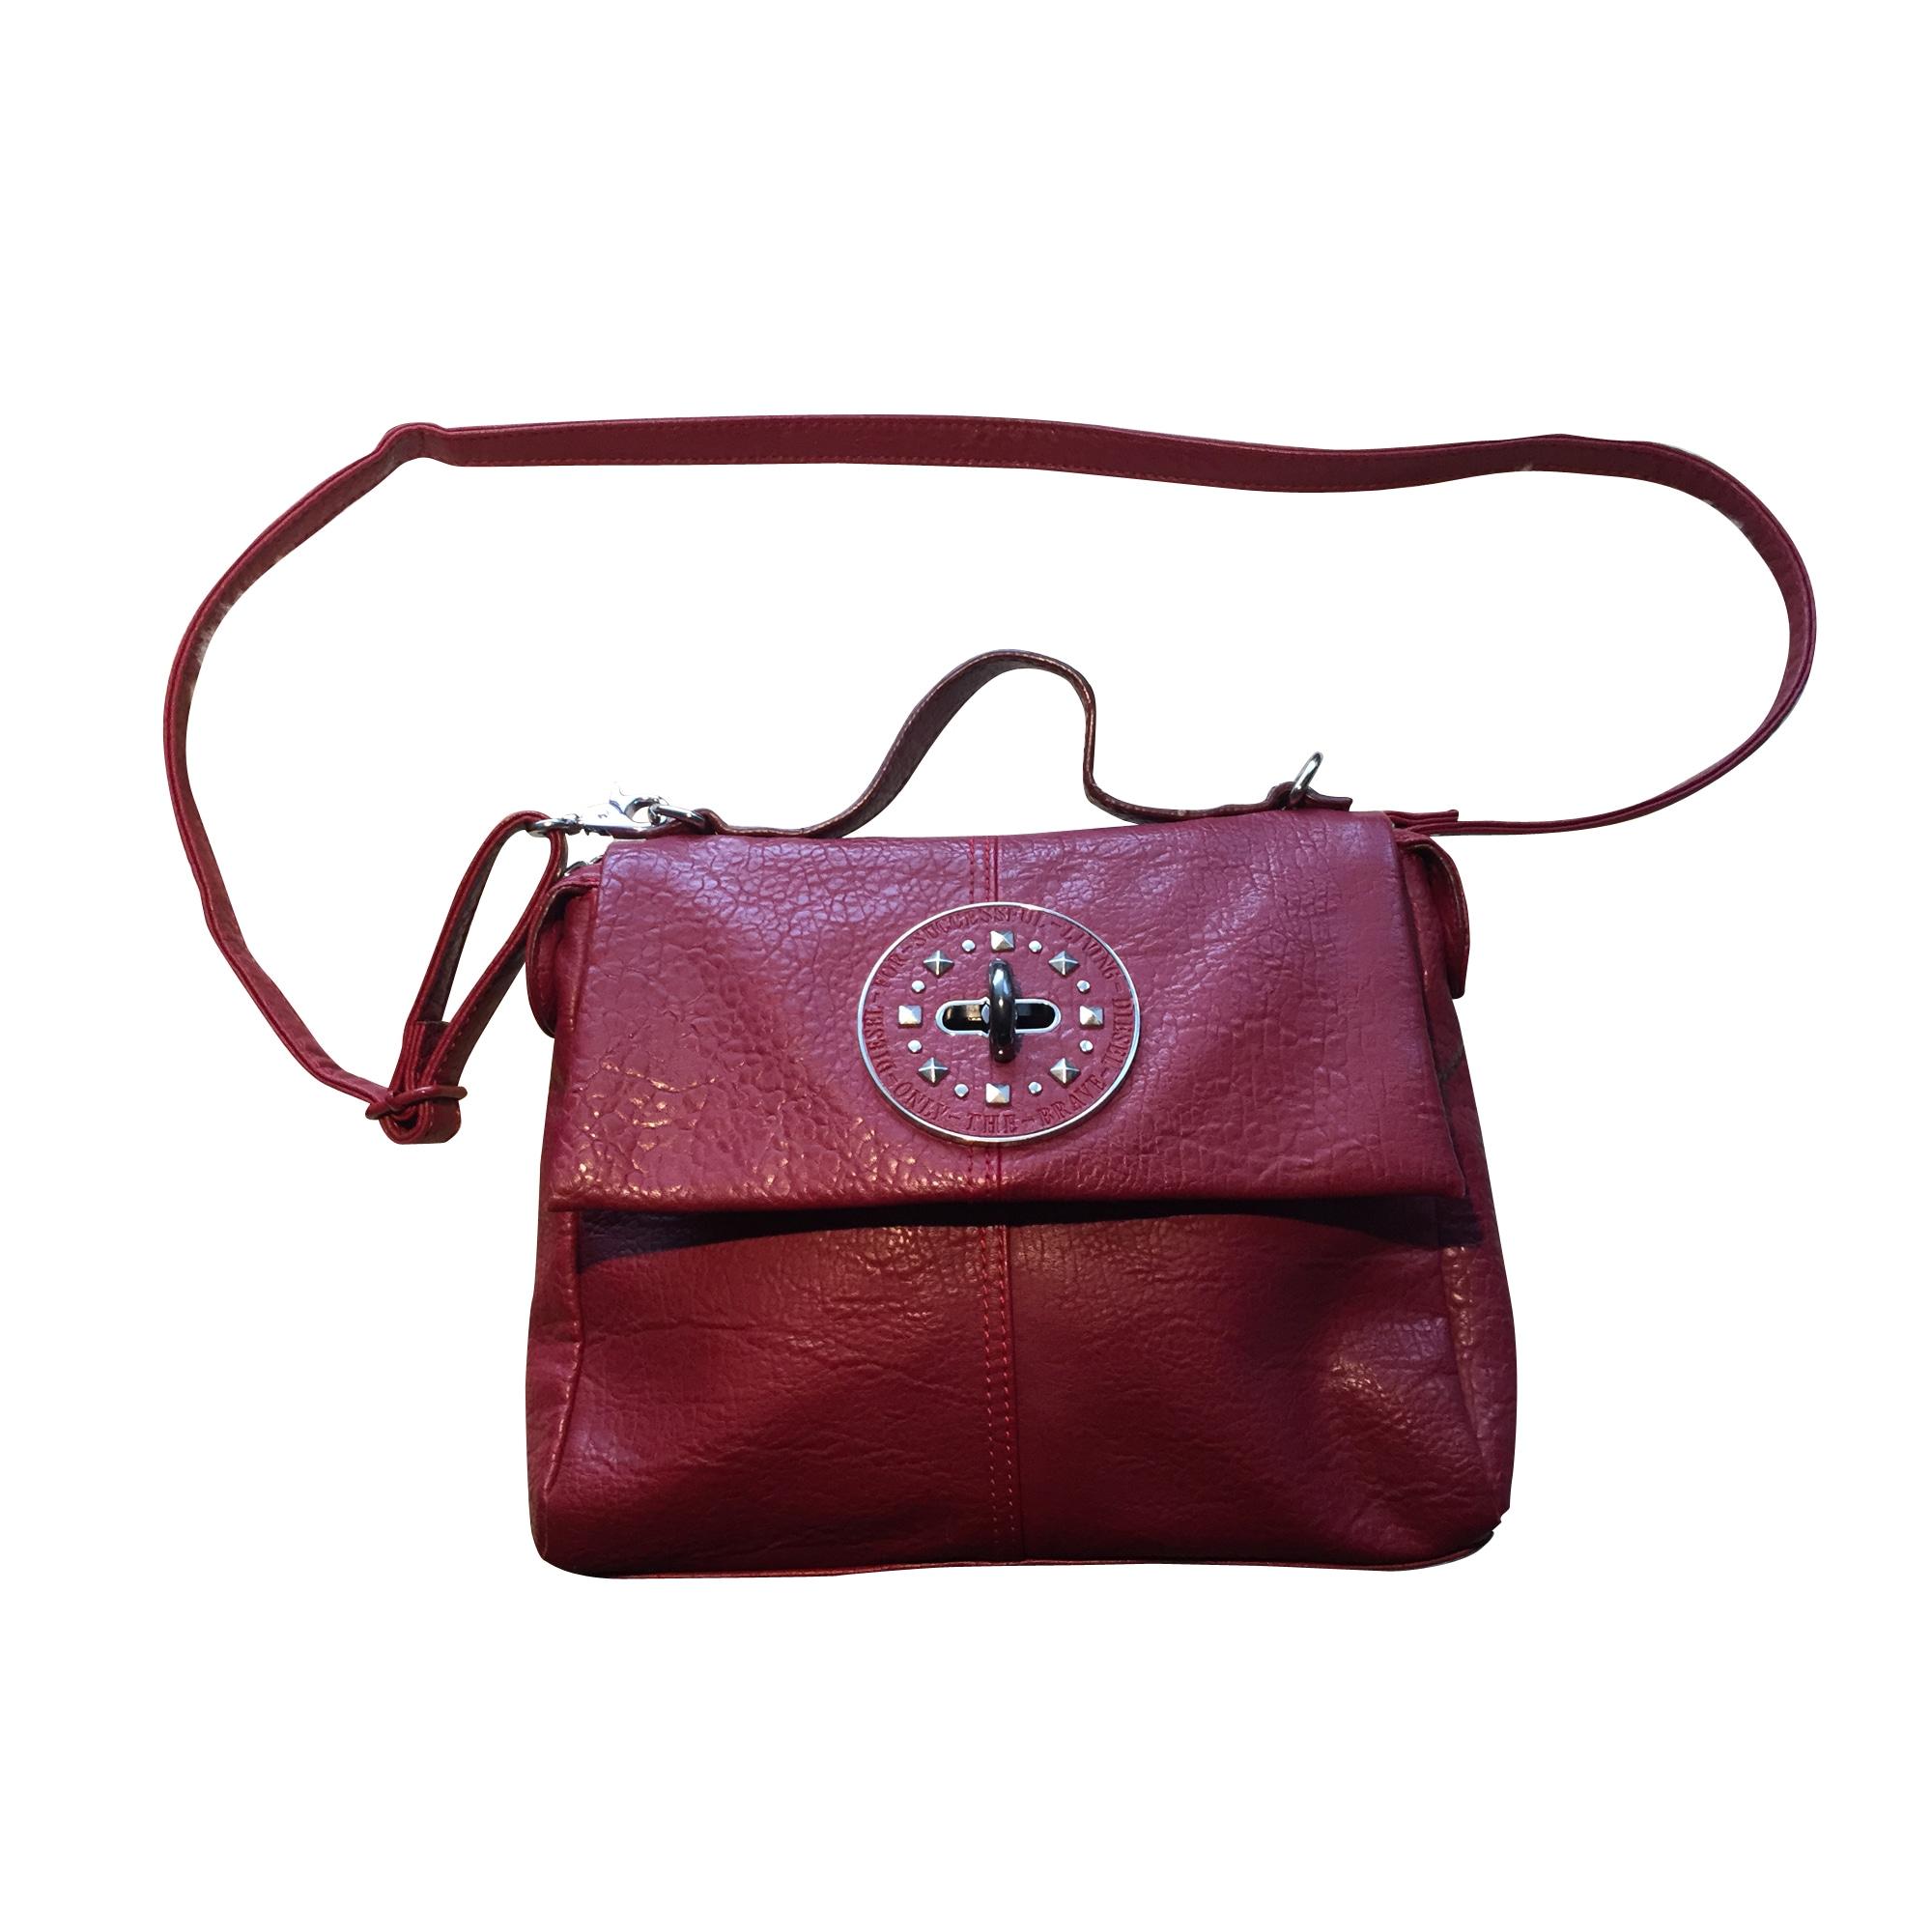 sac main en cuir diesel rouge bordeaux 7151455. Black Bedroom Furniture Sets. Home Design Ideas